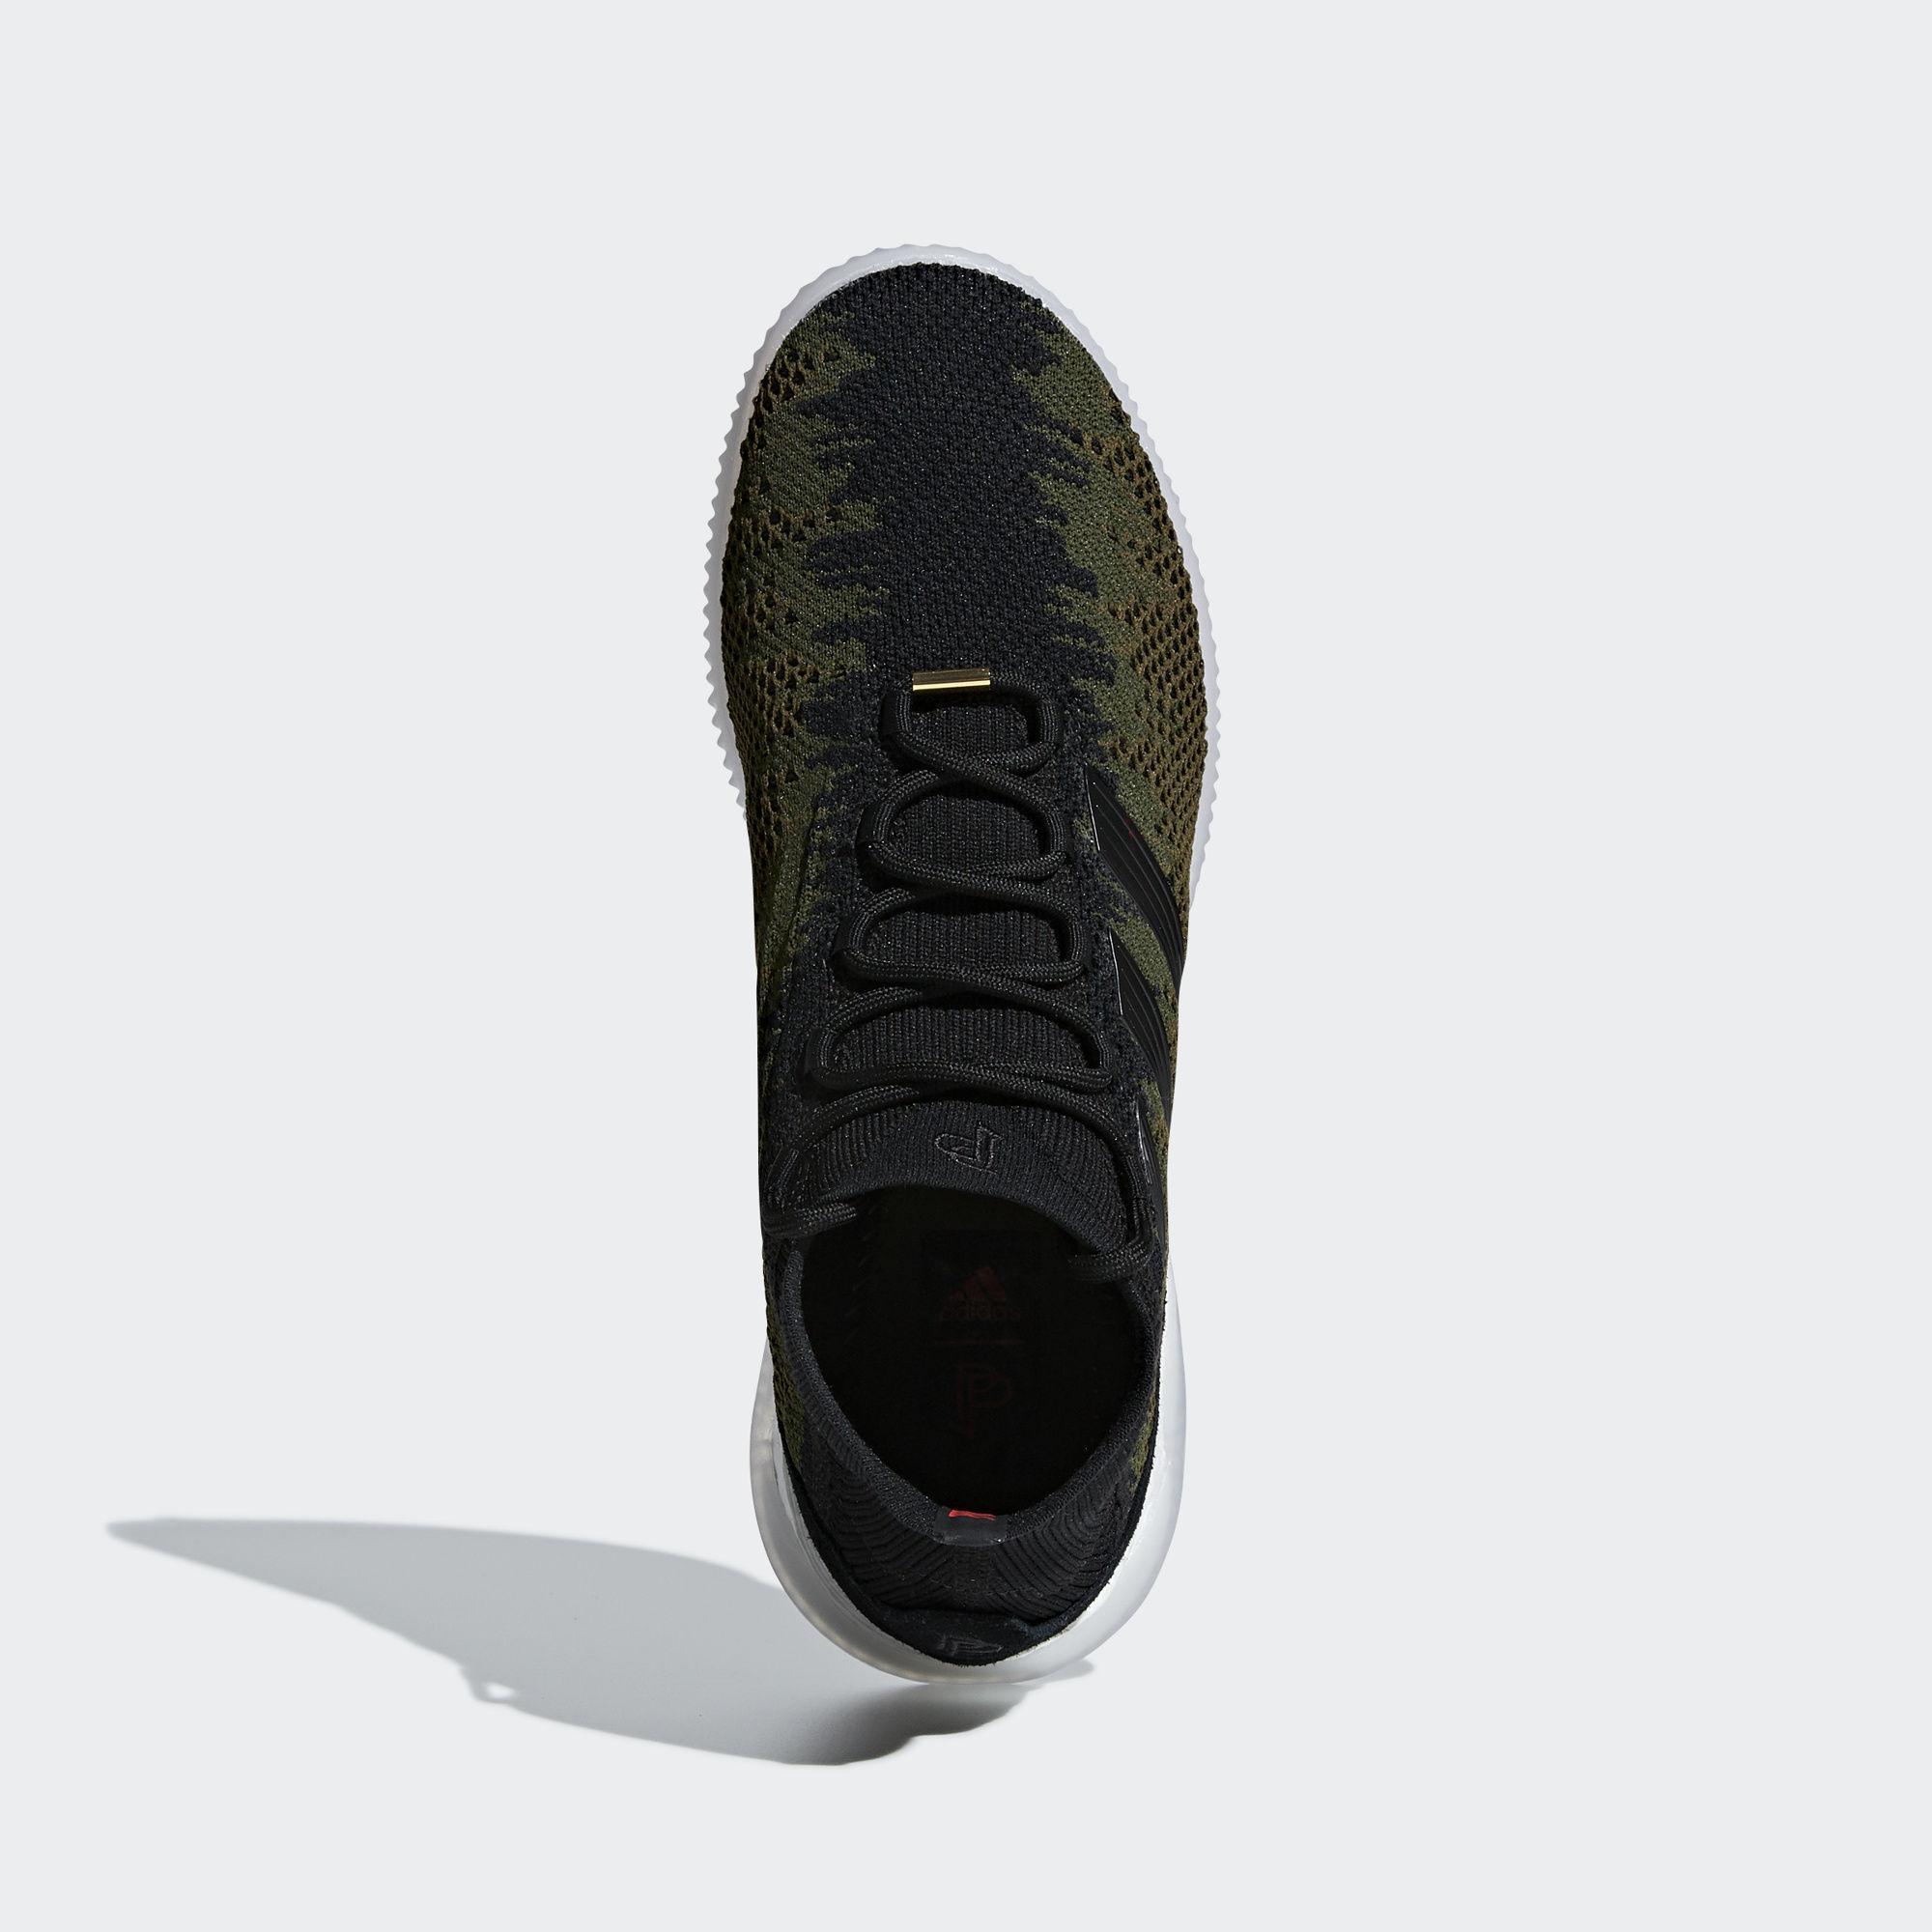 c19fc3a508c Adidas - Black Paul Pogba Predator 18+ Trainers for Men - Lyst. View  fullscreen